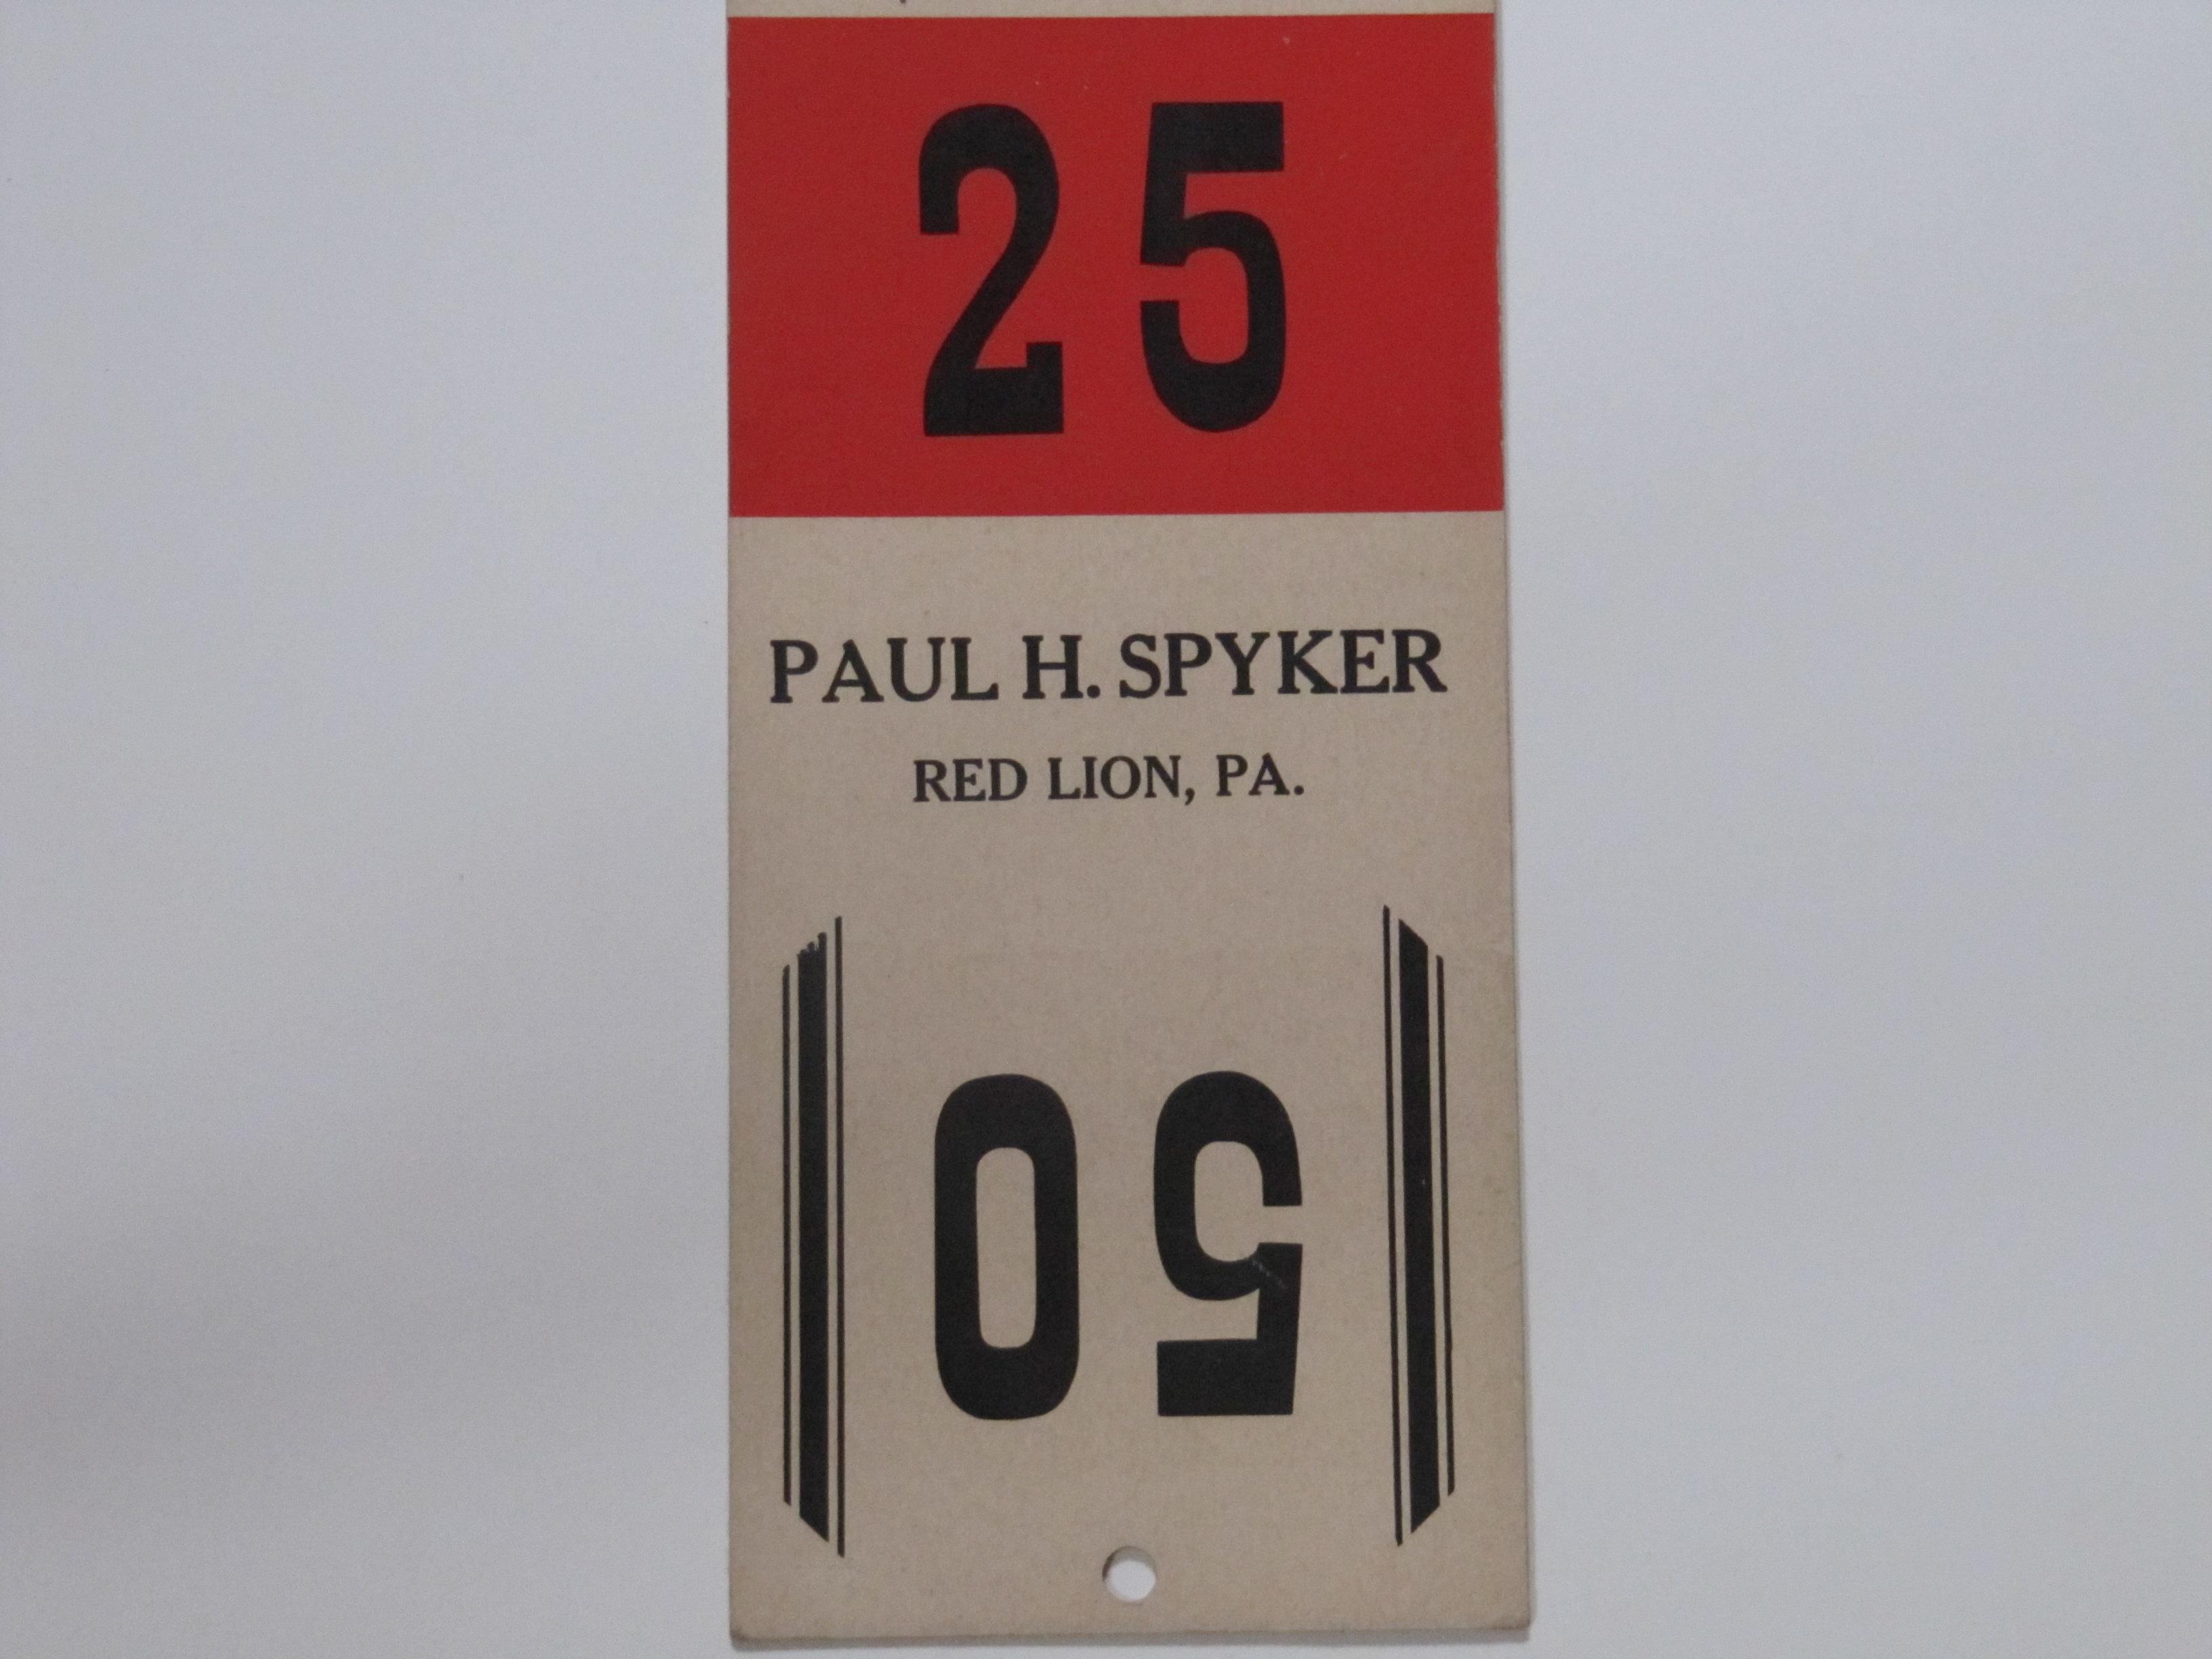 Paul H. Spyker